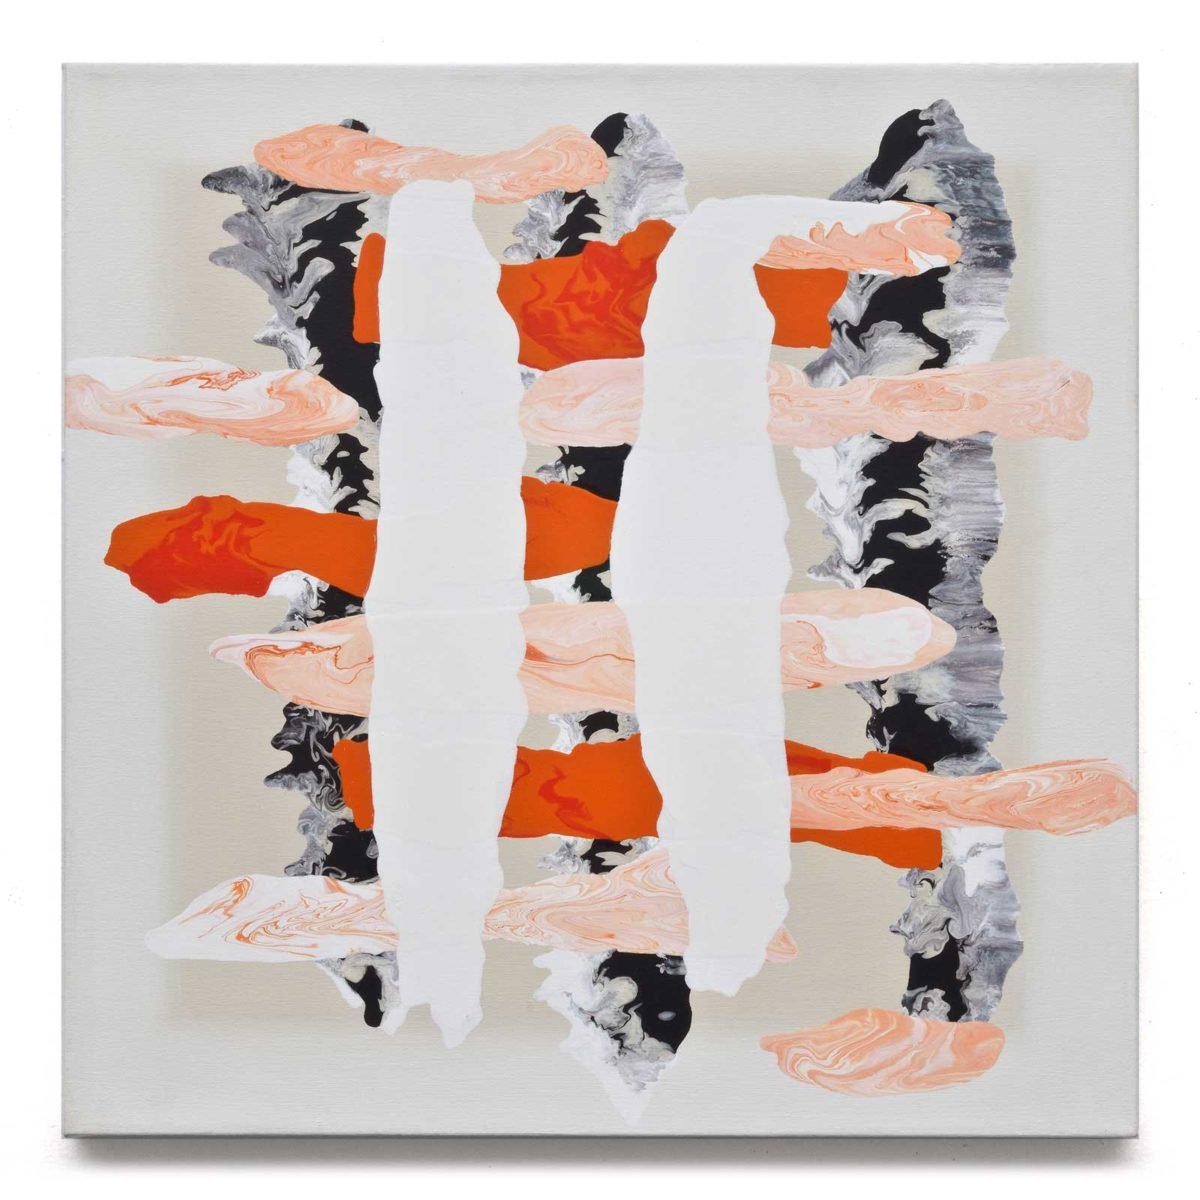 Ephemera-3-oil-on-canvas-60.96 cm x 60.96 cm.